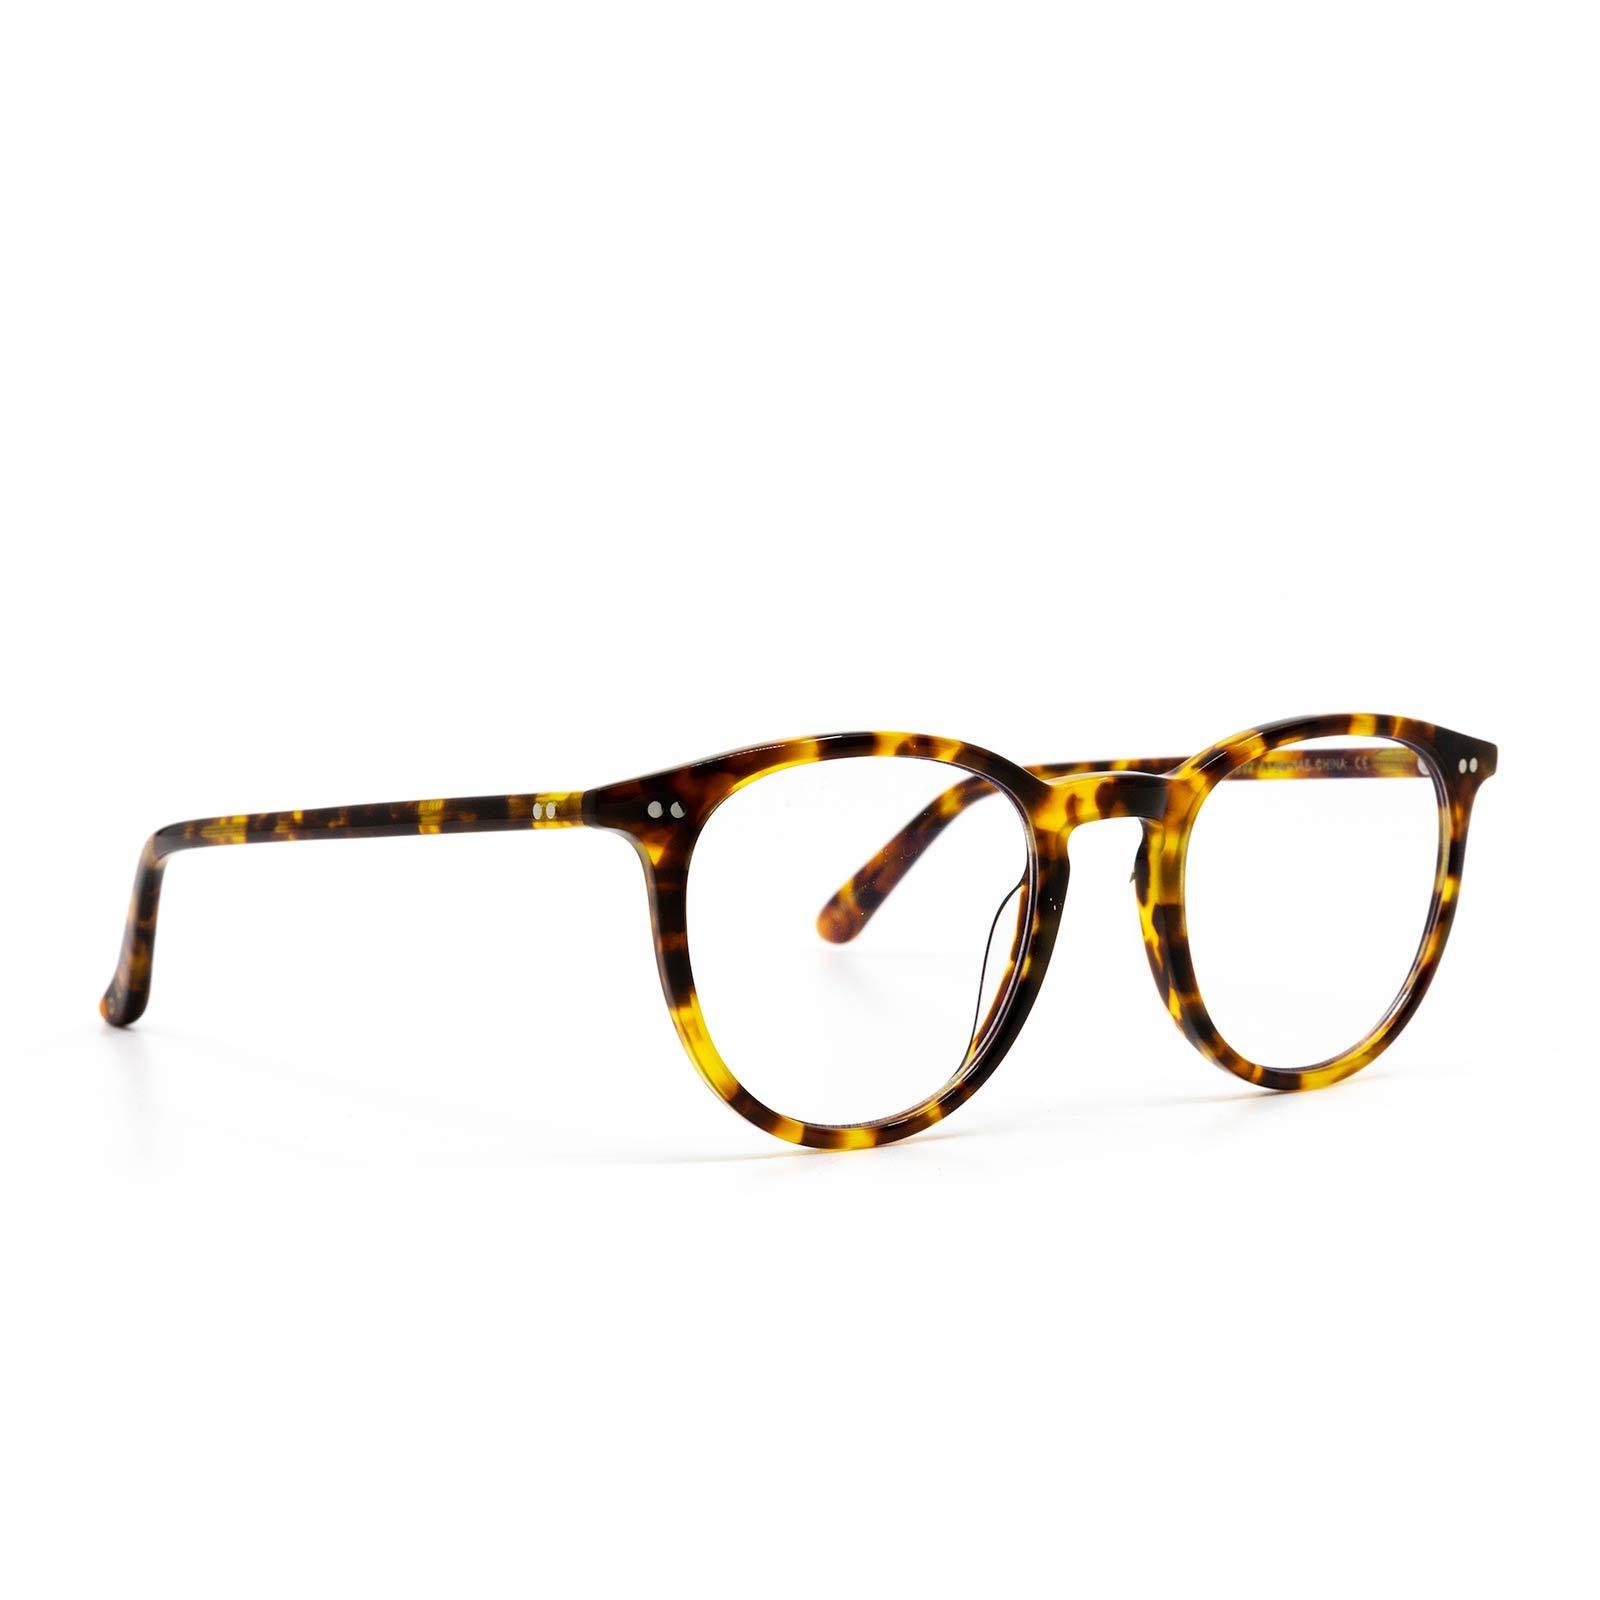 Diff Eyewear In Haze Amber Tortoise Organic Bunny